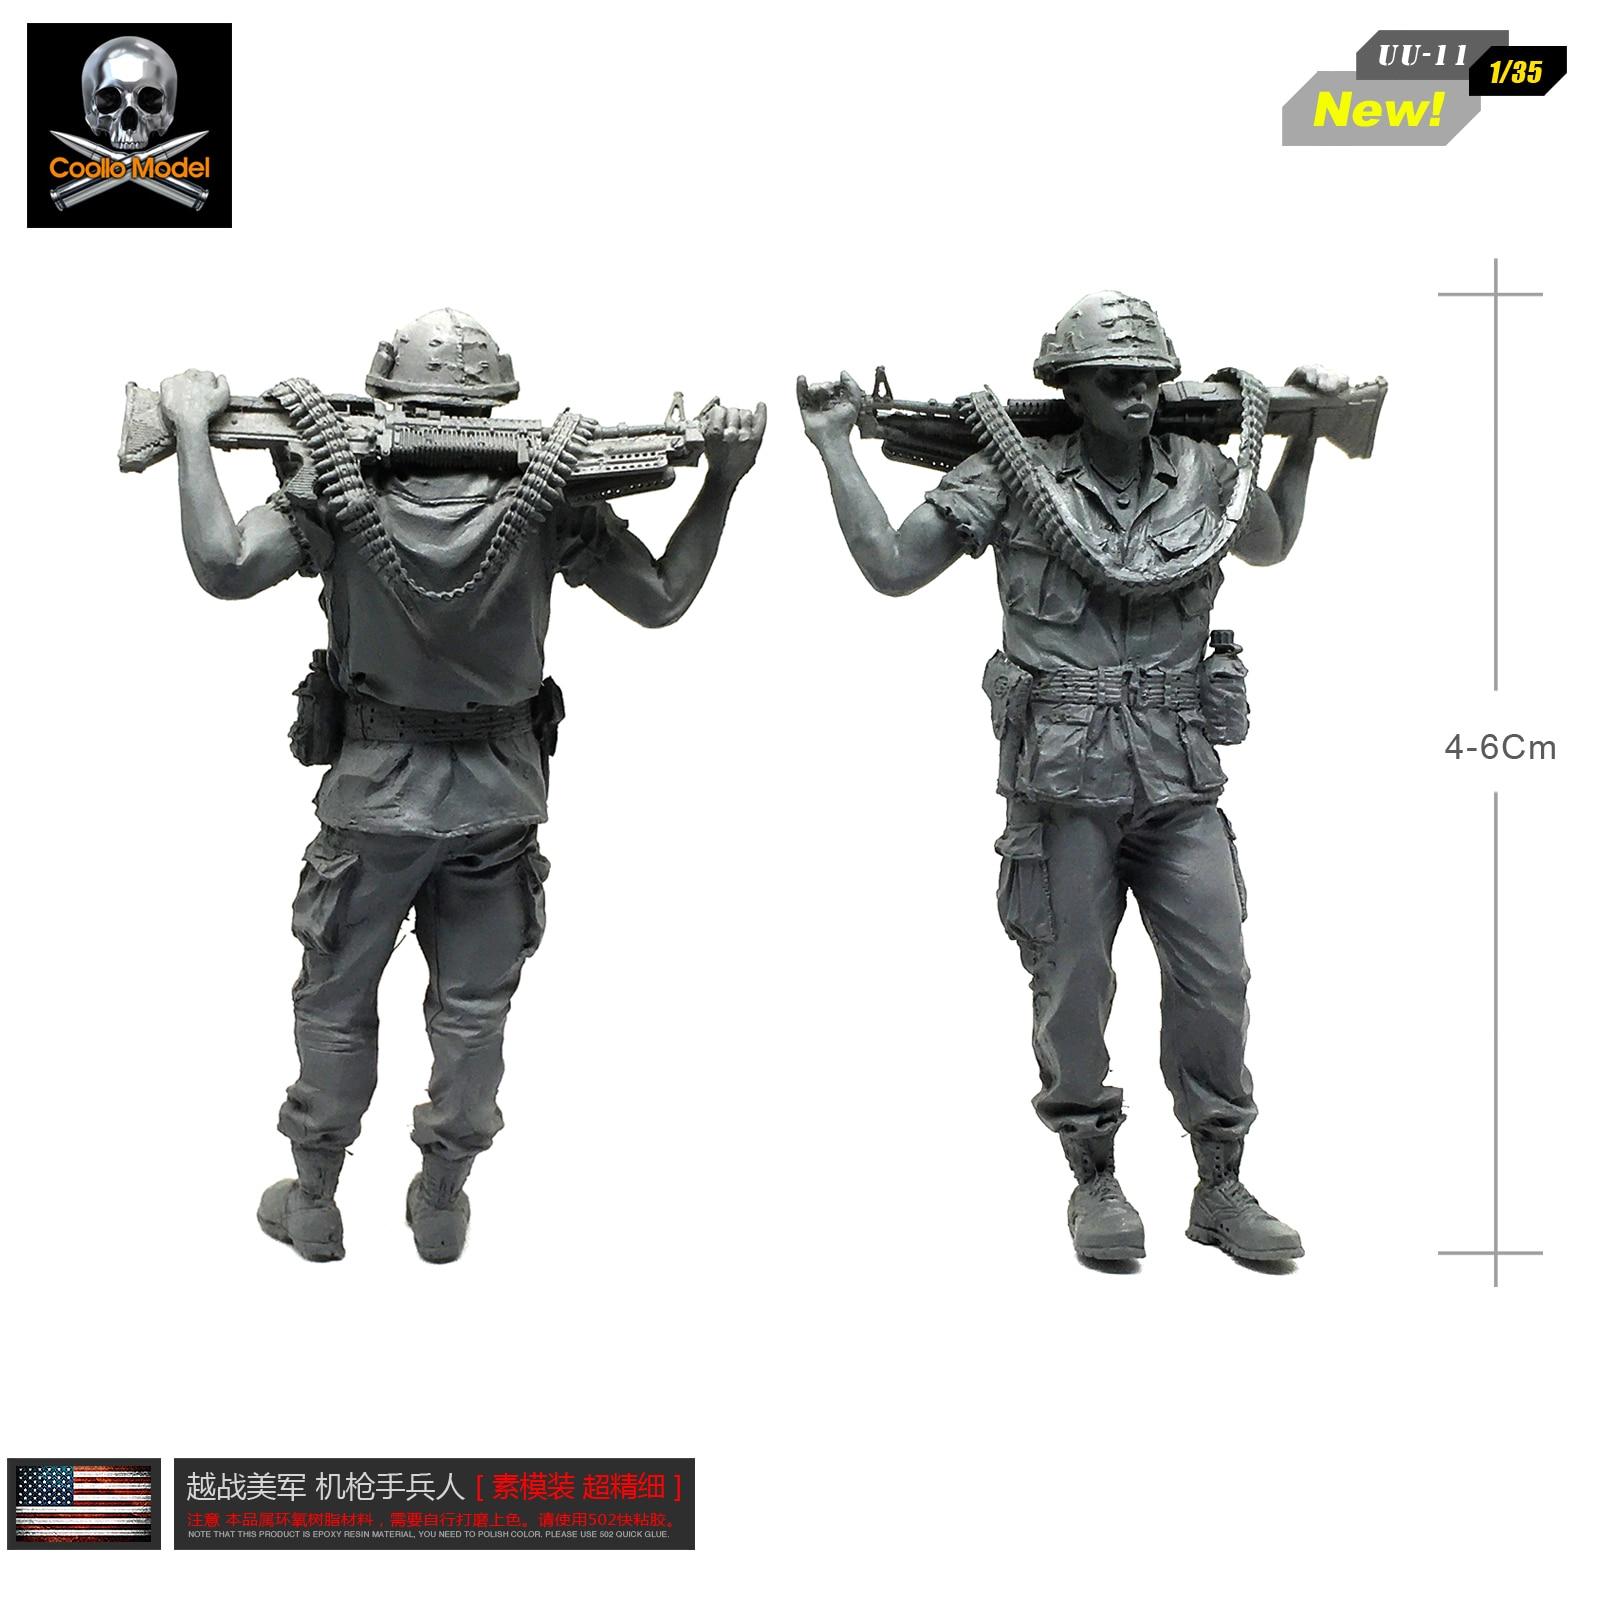 1/35 Figure Kits  Us Marine Corps 1:35 Resin Soldier  Machine Gunner Self-assembled UU-11